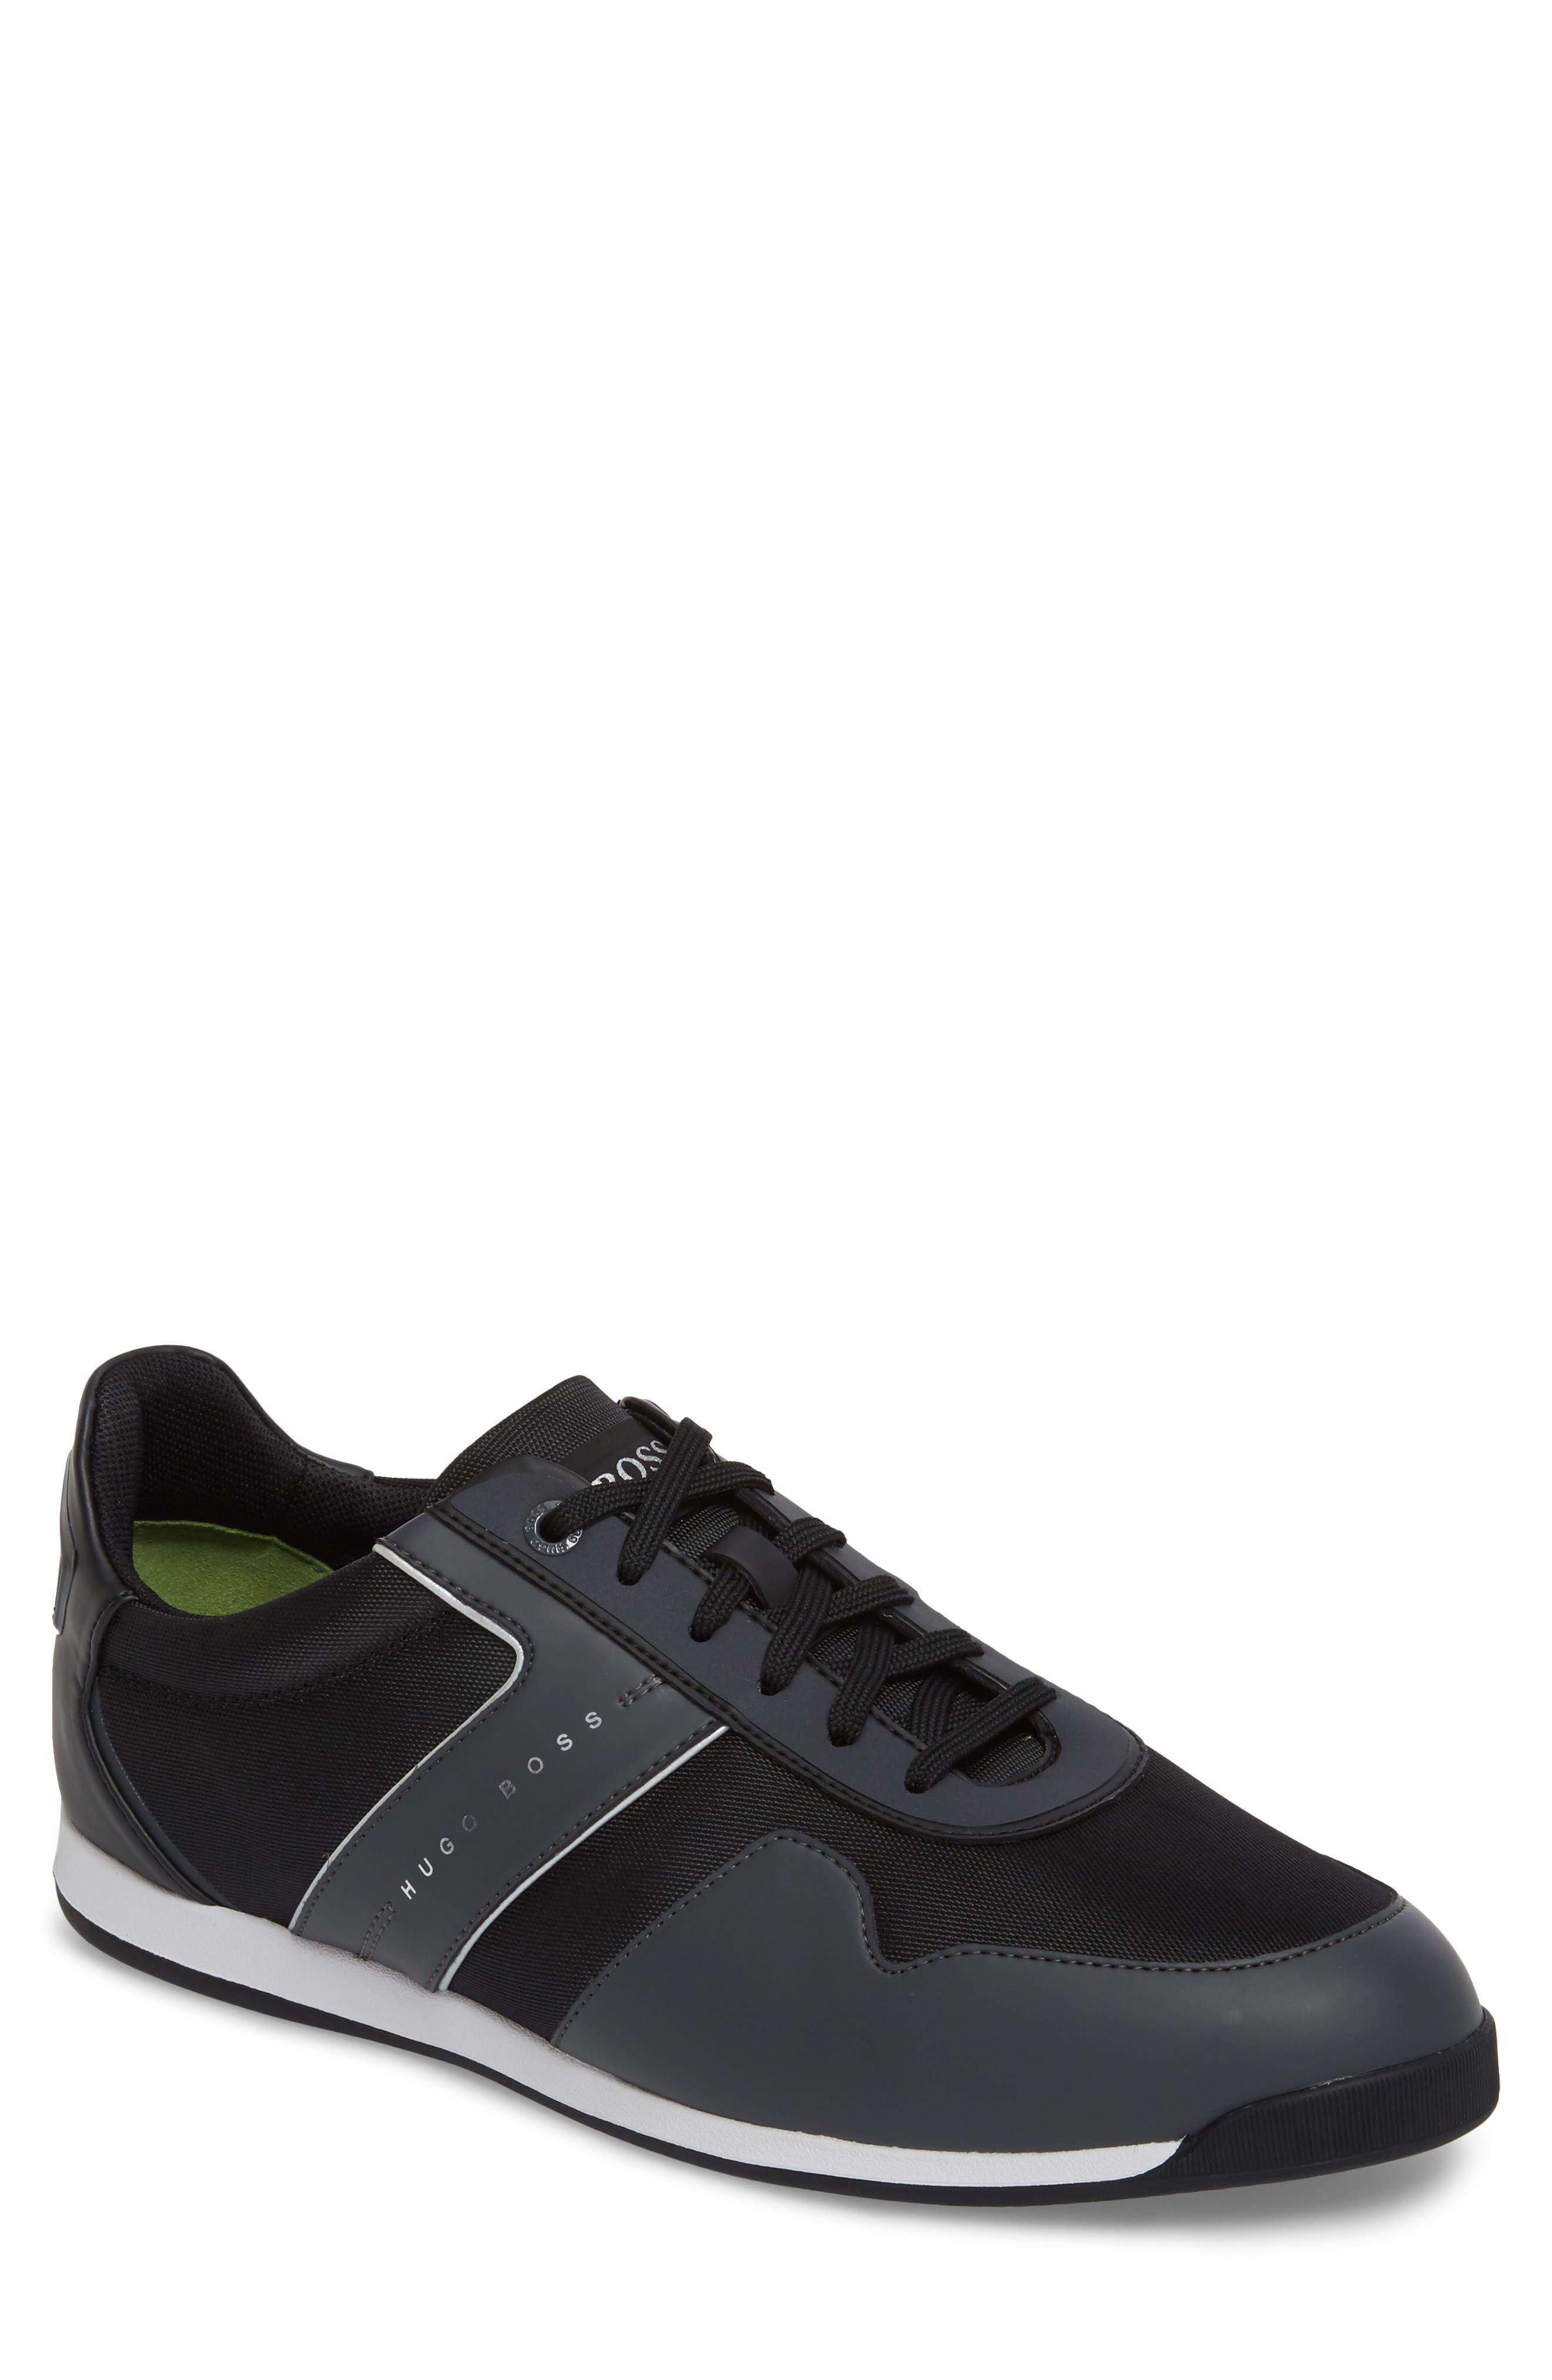 Maze Water Resistant Low Top Sneaker,                         Main,                         color, 020